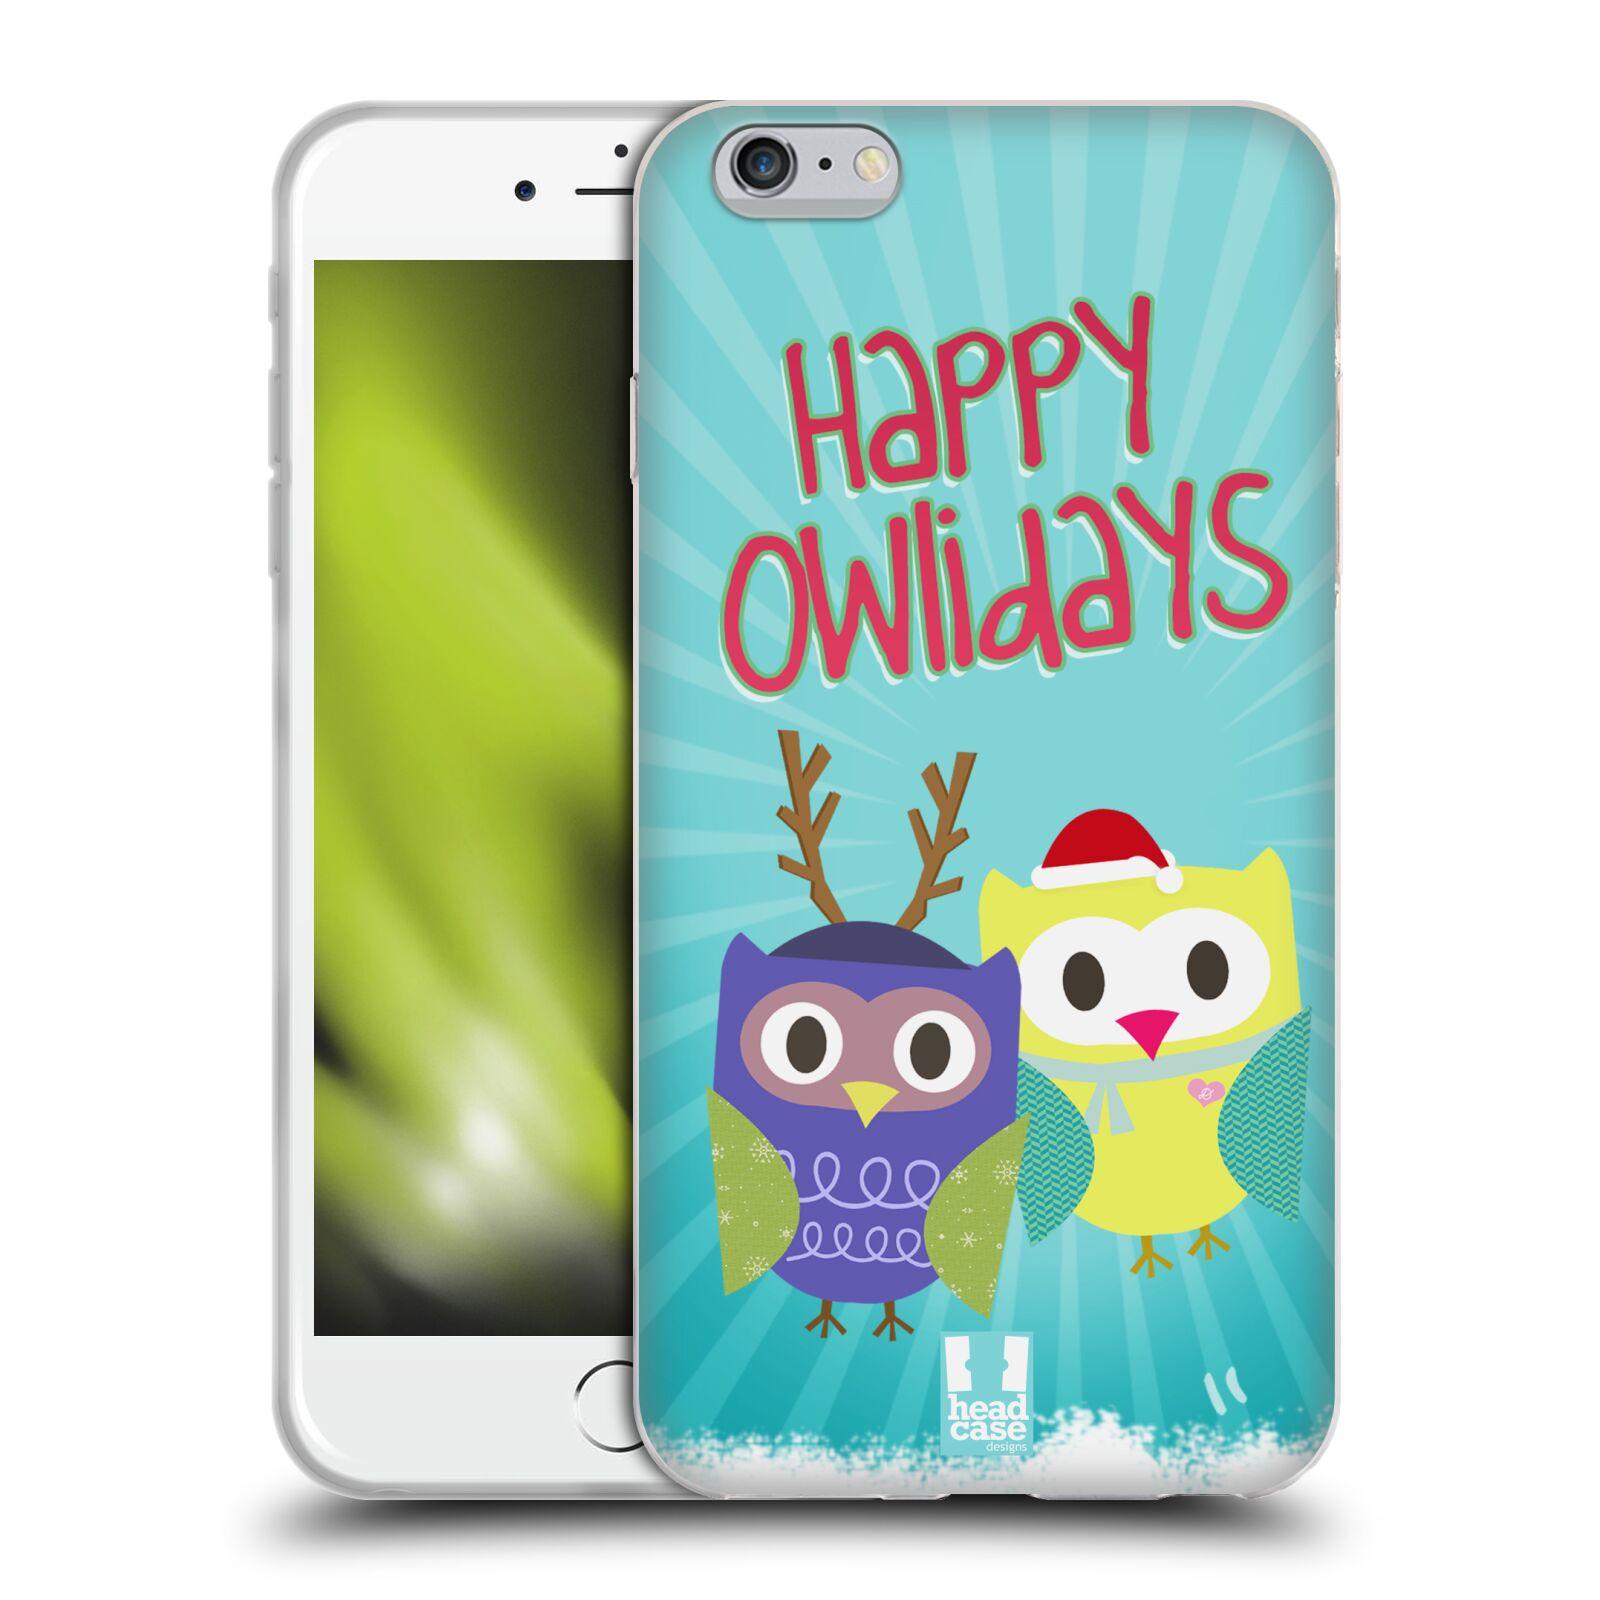 HEAD CASE silikonový obal na mobil Apple Iphone 6 PLUS/ 6S PLUS vzor Zimní sovičky modré pozadí